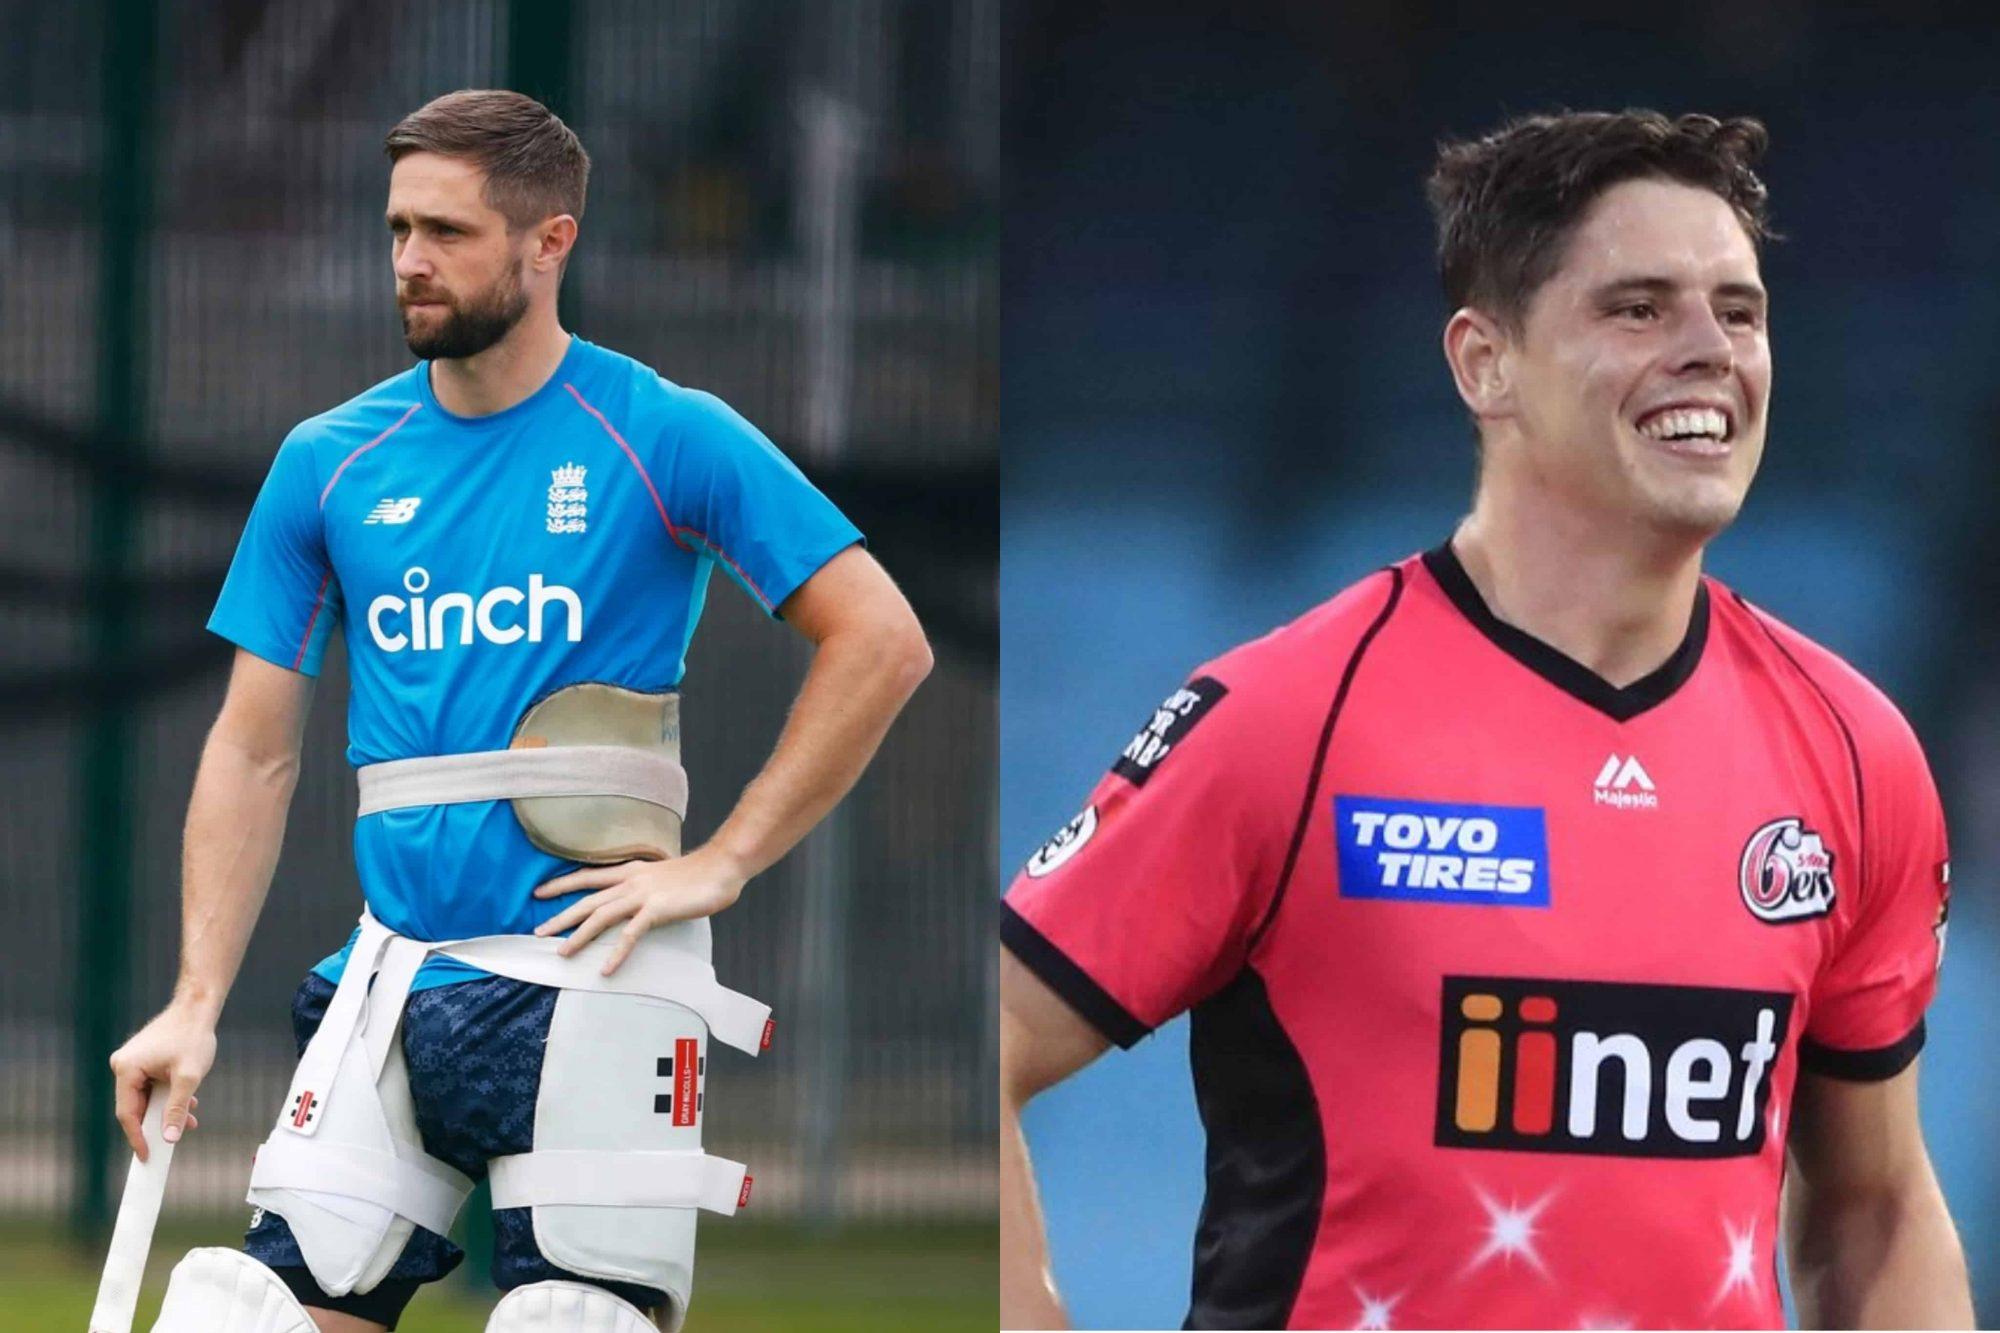 IPL 2021: Ben Dwarshuis Replaces Chris Woakes In Delhi Capitals For UAE Leg